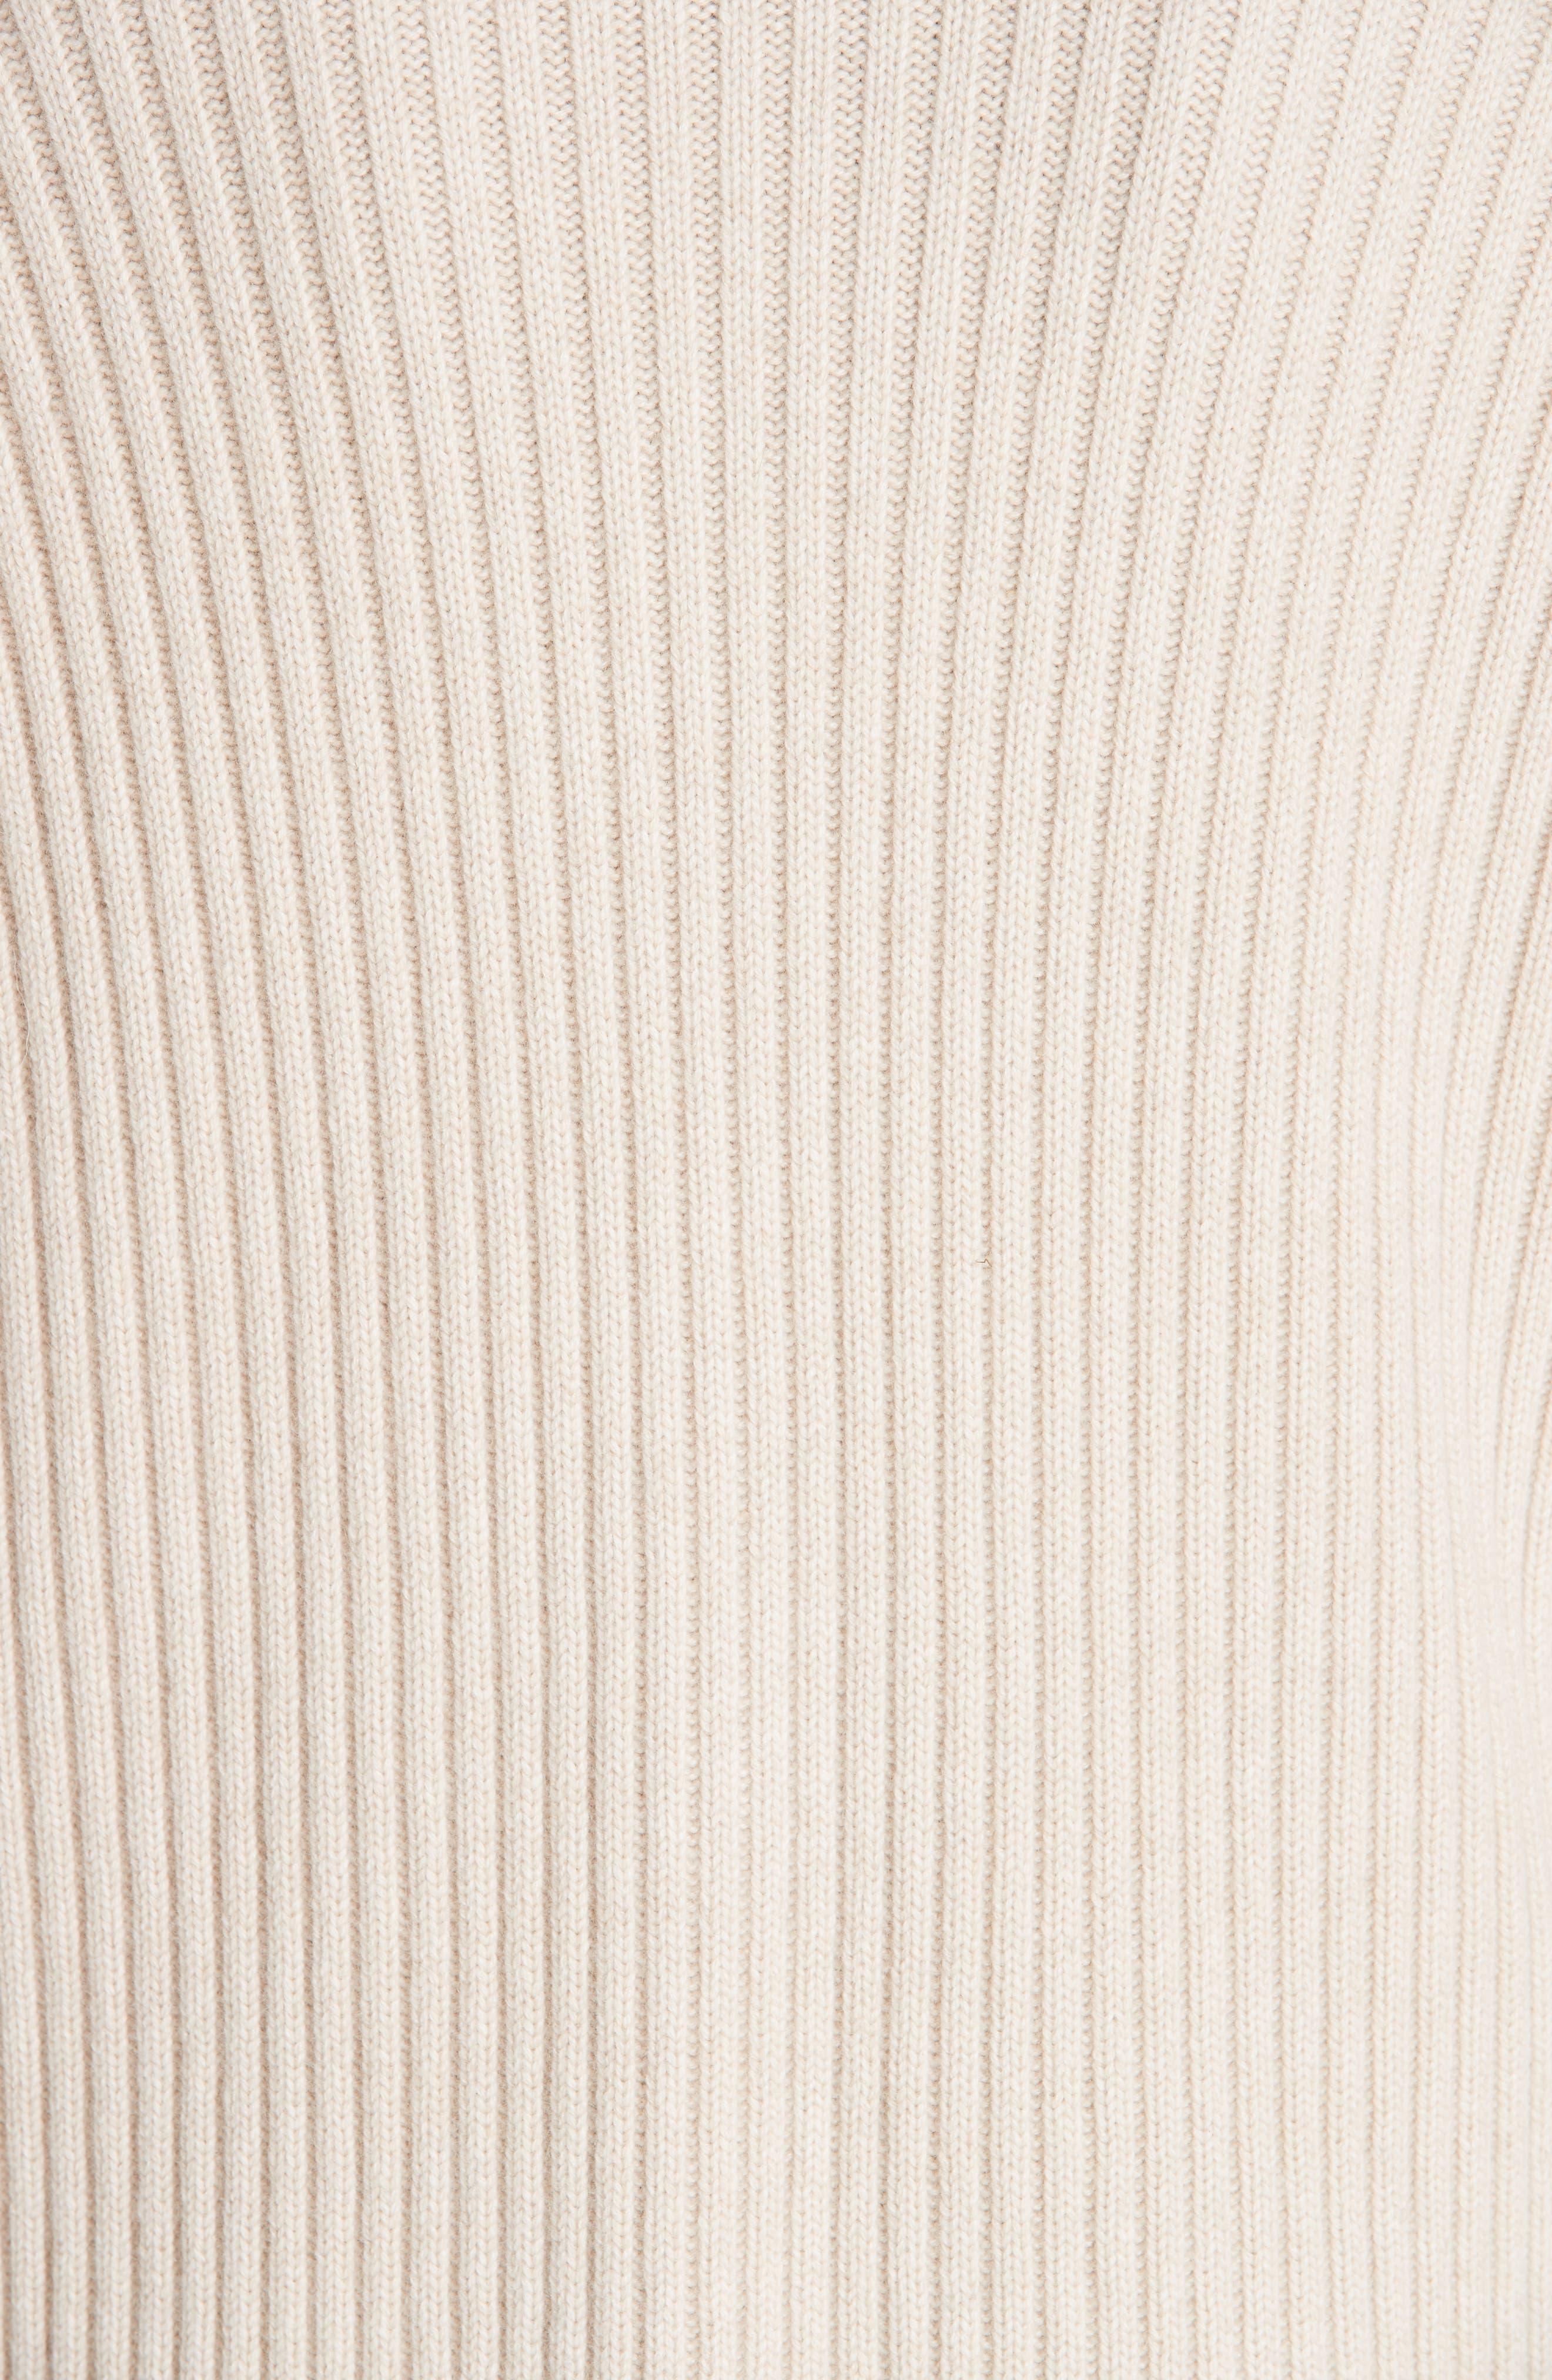 Lia Cashmere & Merino Wool Sweater,                             Alternate thumbnail 6, color,                             SAND